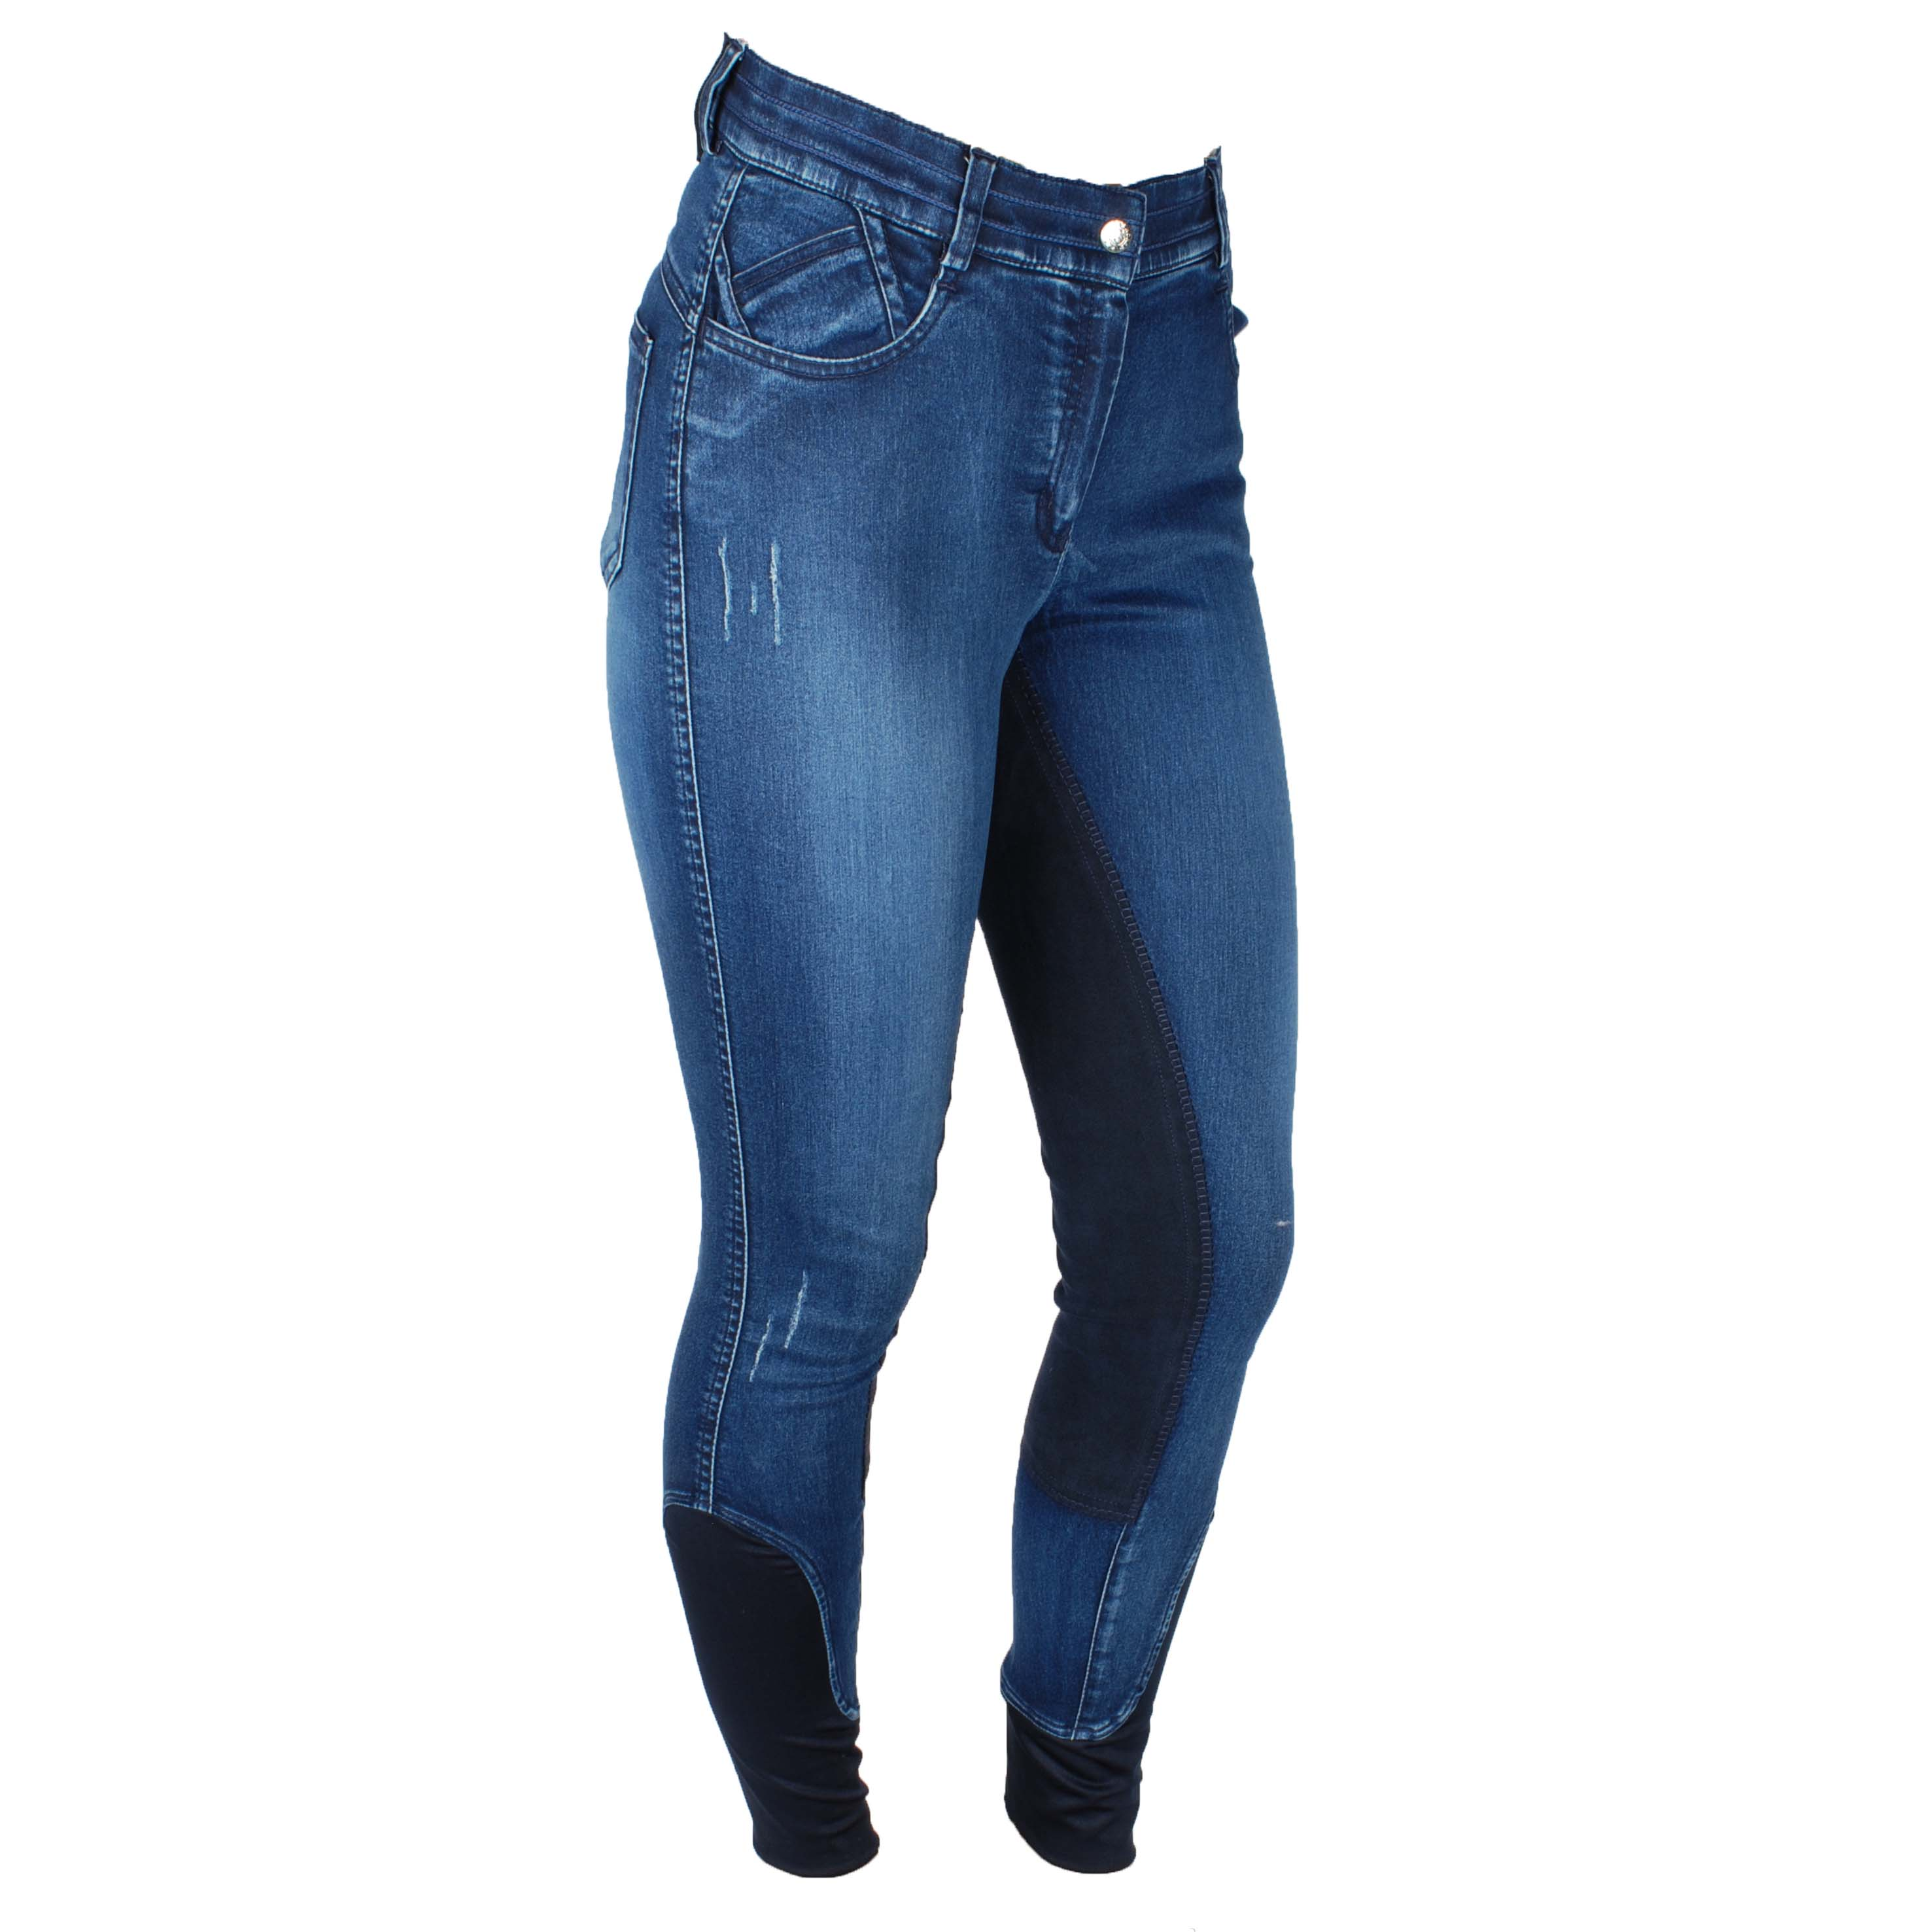 Harrys Horse Burton plus rijbroek jeans maat:46